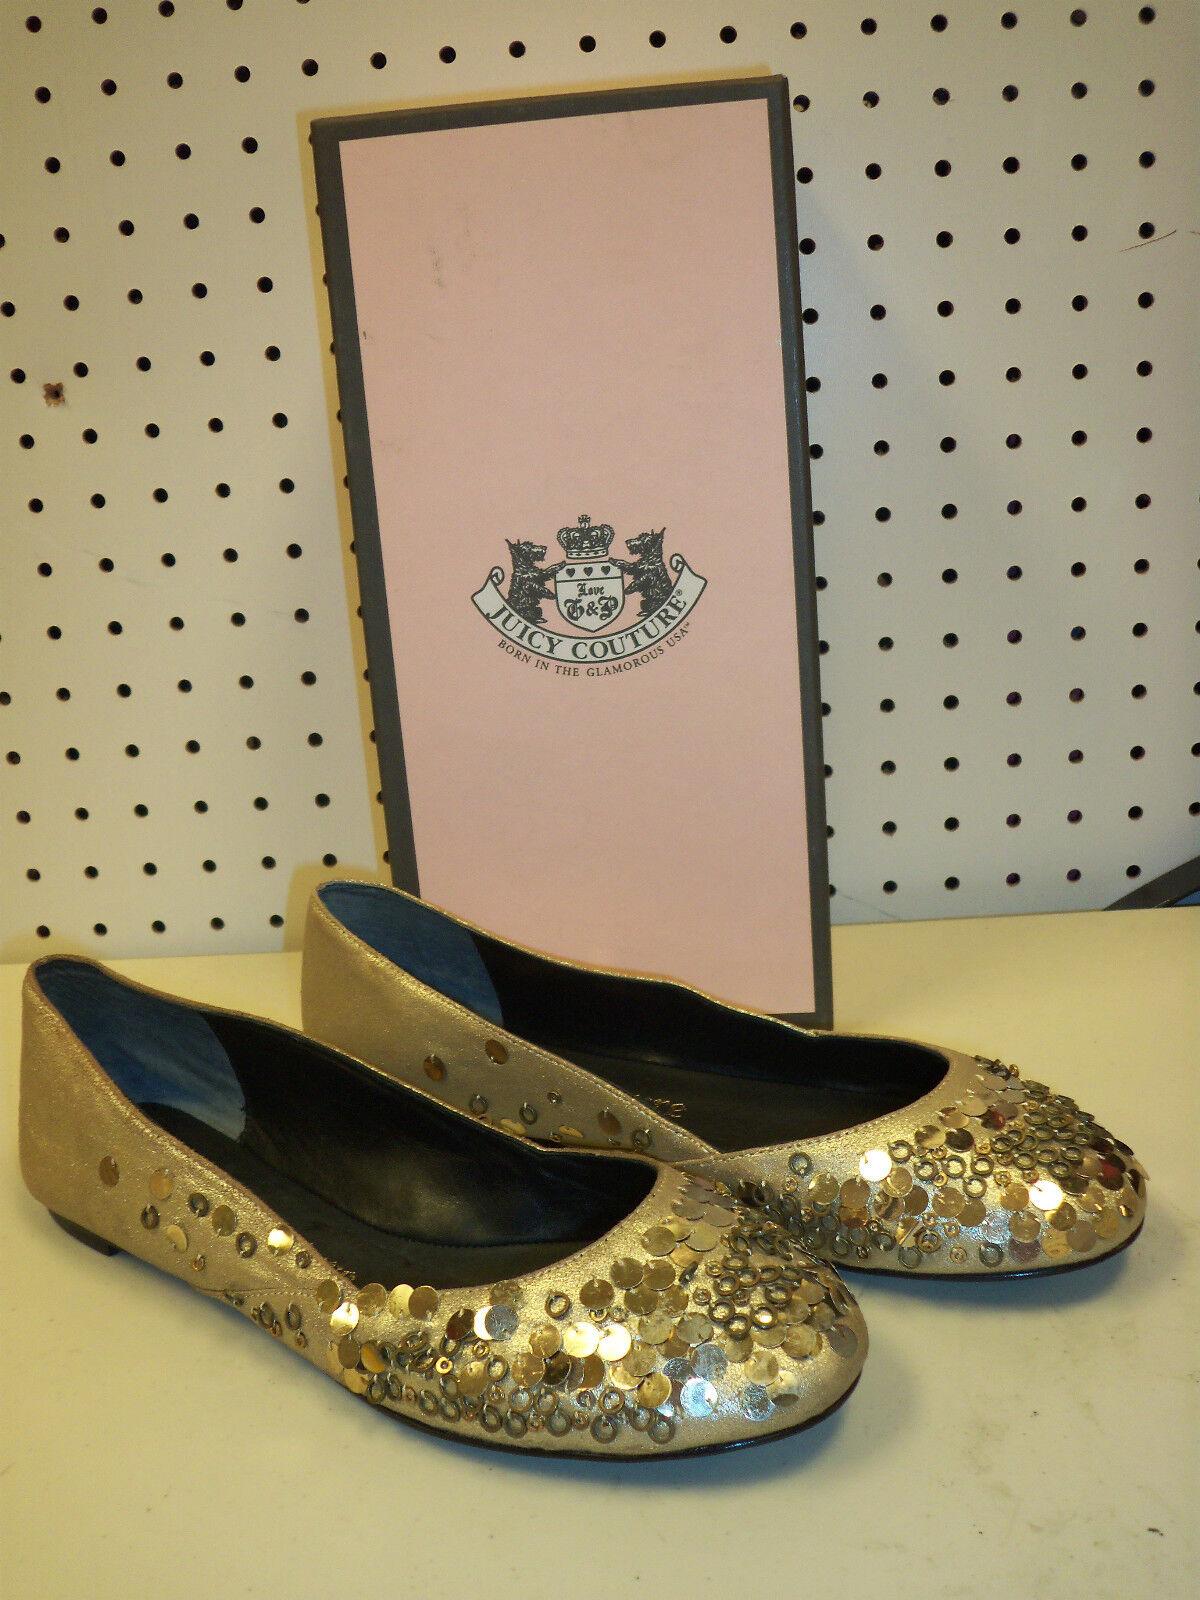 Juicy Couture NEU Damenschuhe Anita 9.5 M Platino Dust Metallic Suede Flats Schuhes